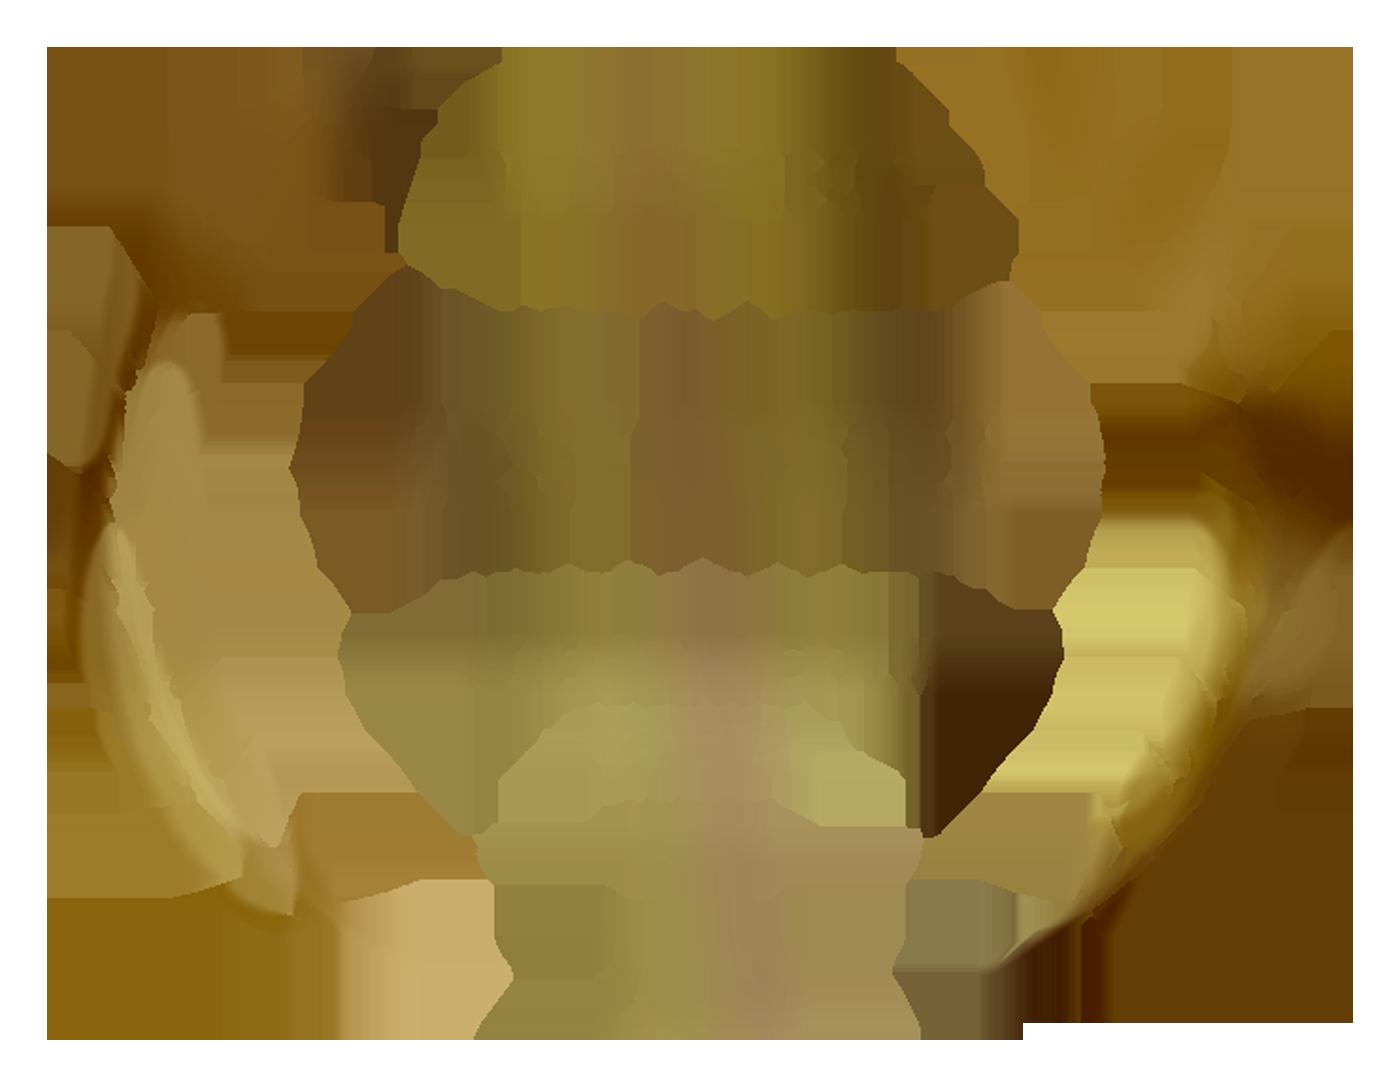 Fragments Winner Best Poster Alternative Film Festival design by Cesare Asaro 2018